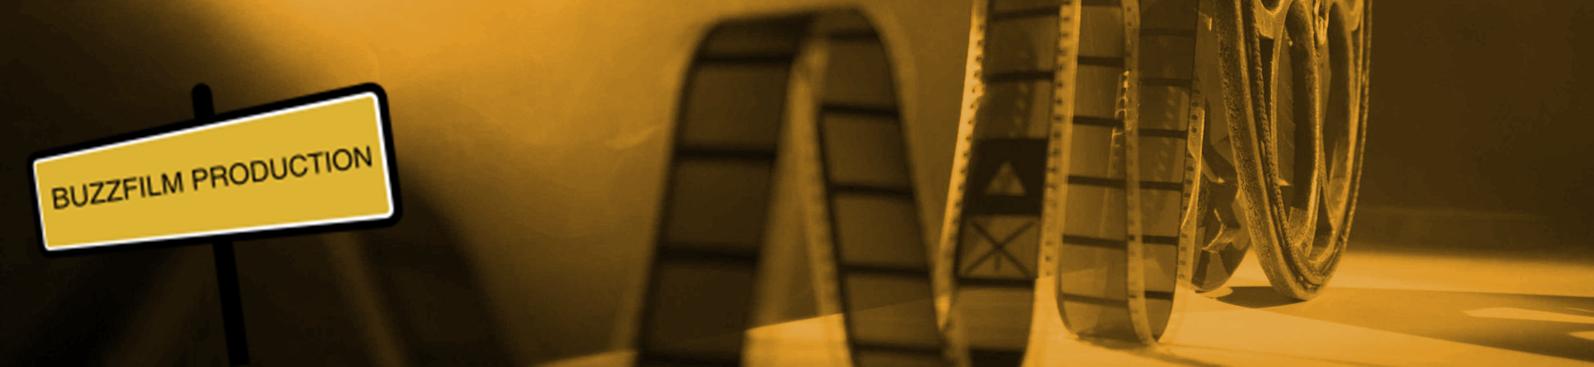 Buzzfilm Production